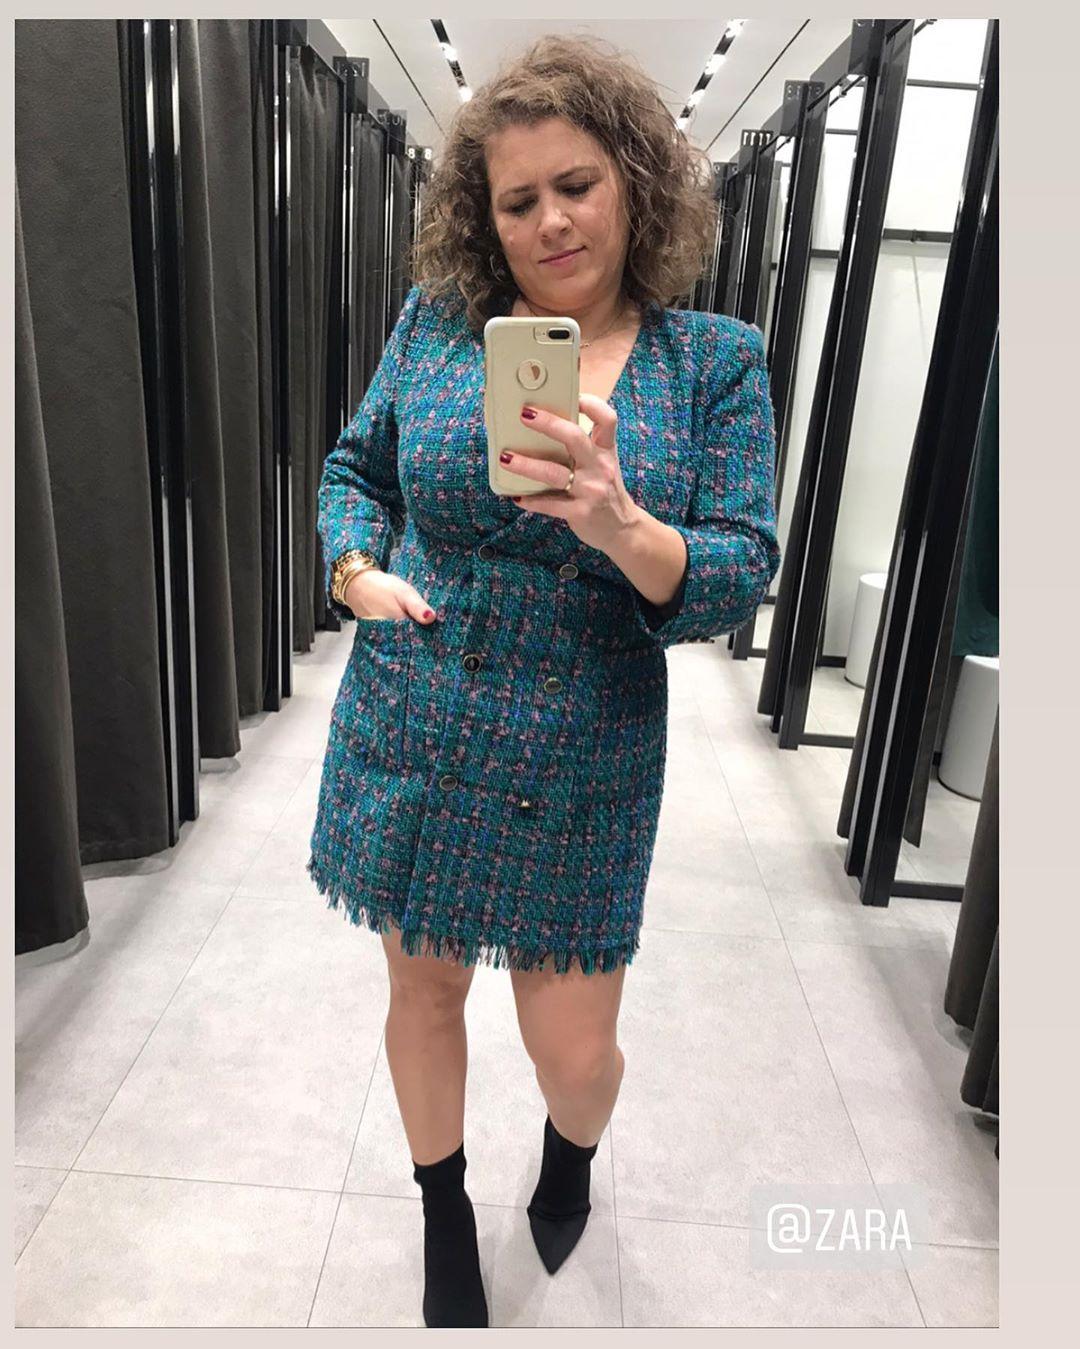 jacket dress with buttons de Zara sur iria_boiro